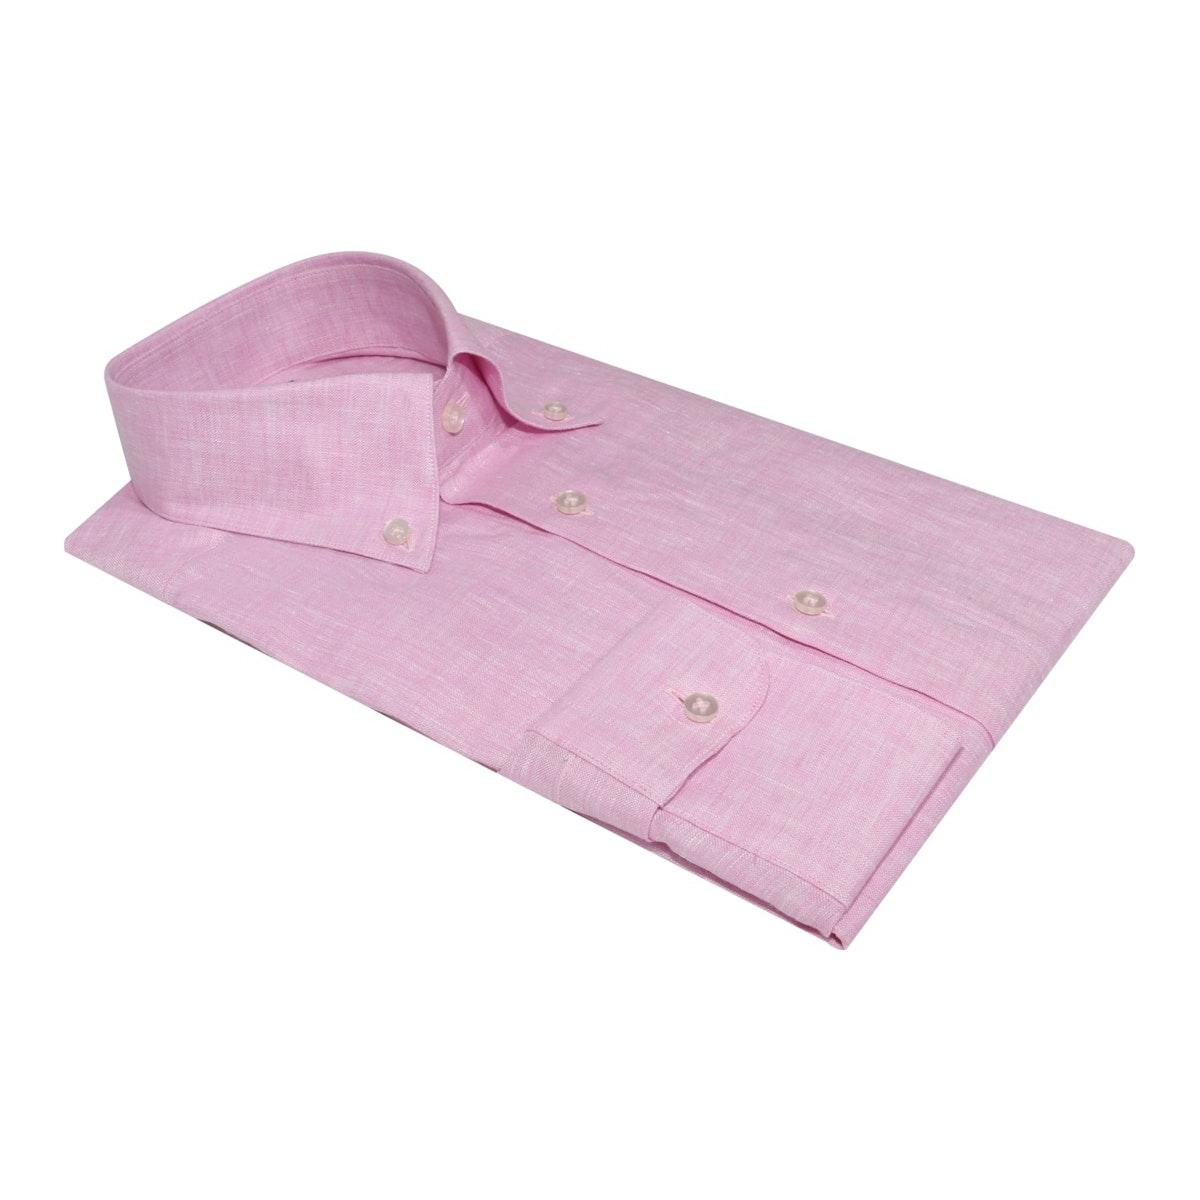 InStitchu Collection The Vatia Pink Linen Shirt